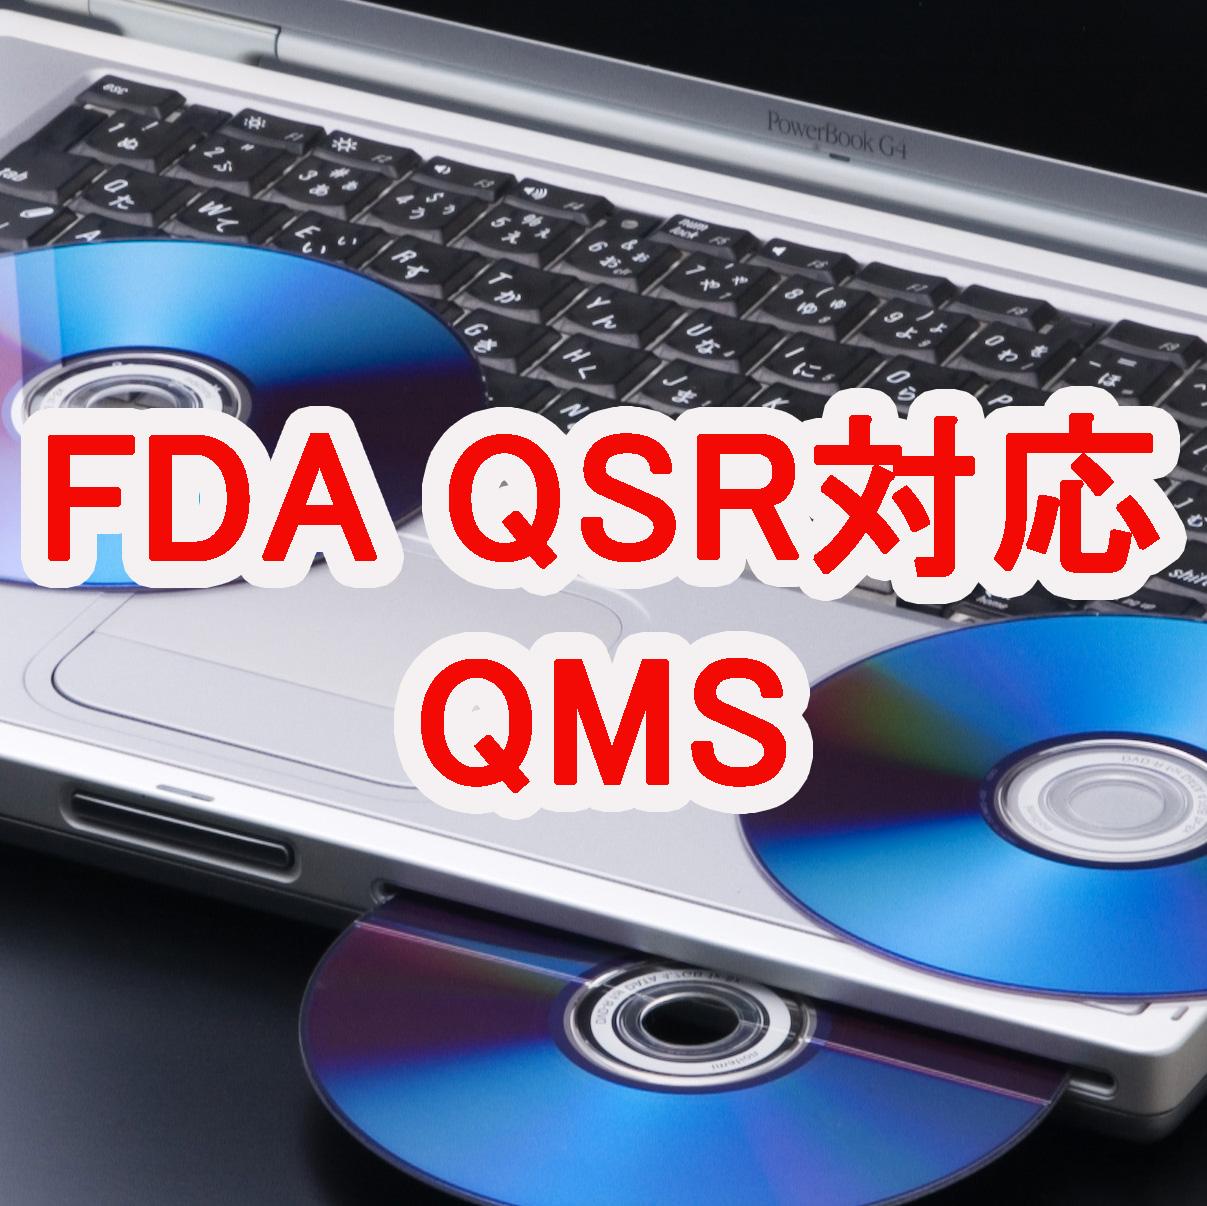 【FDA CFR 820 QSR対応】設計変更規程・手順書・様式